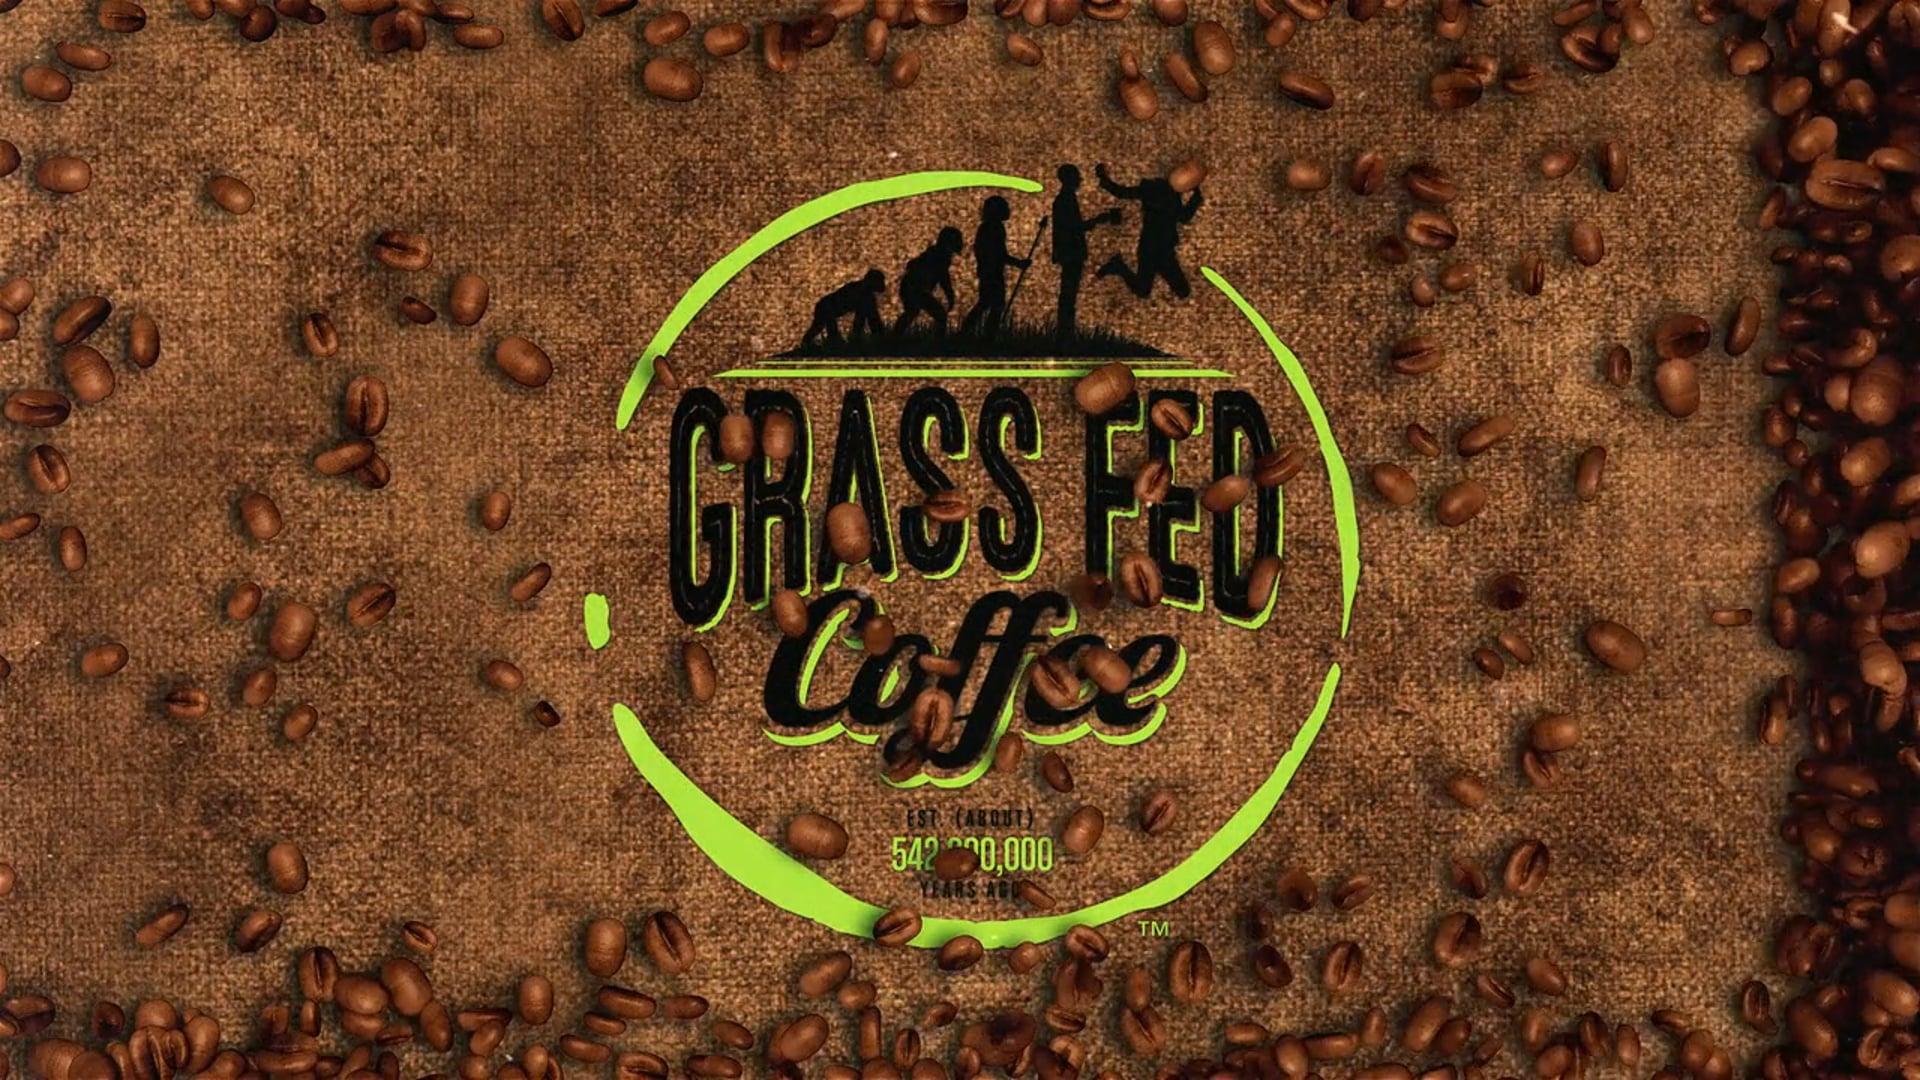 Grass Fed Coffee Ad